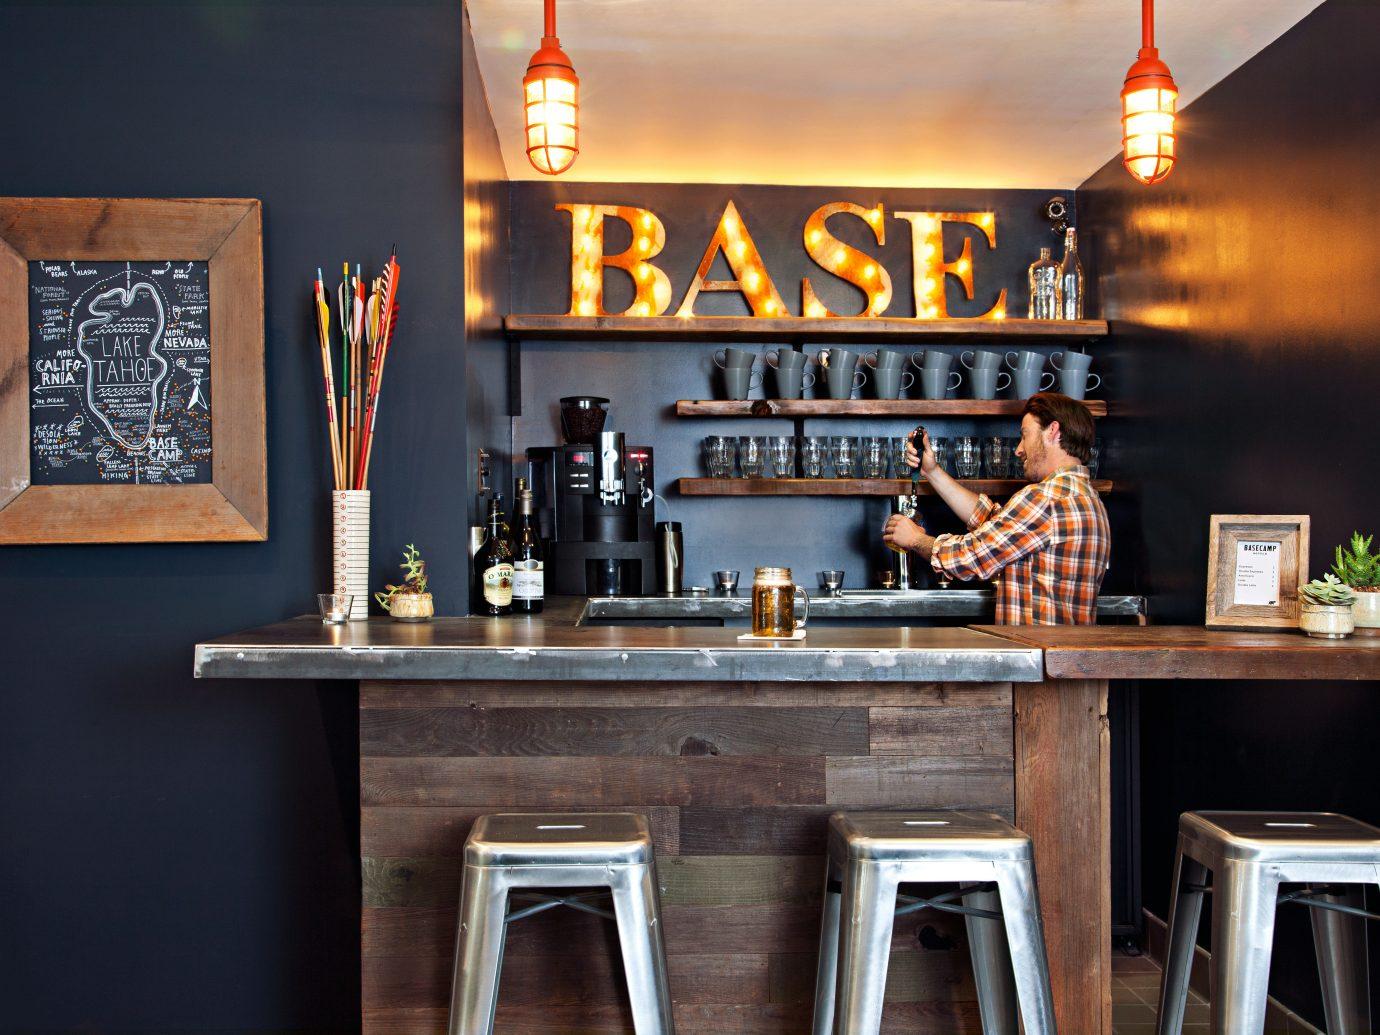 Bar Beach Design Drink Eco Glamping Rustic indoor restaurant shelf